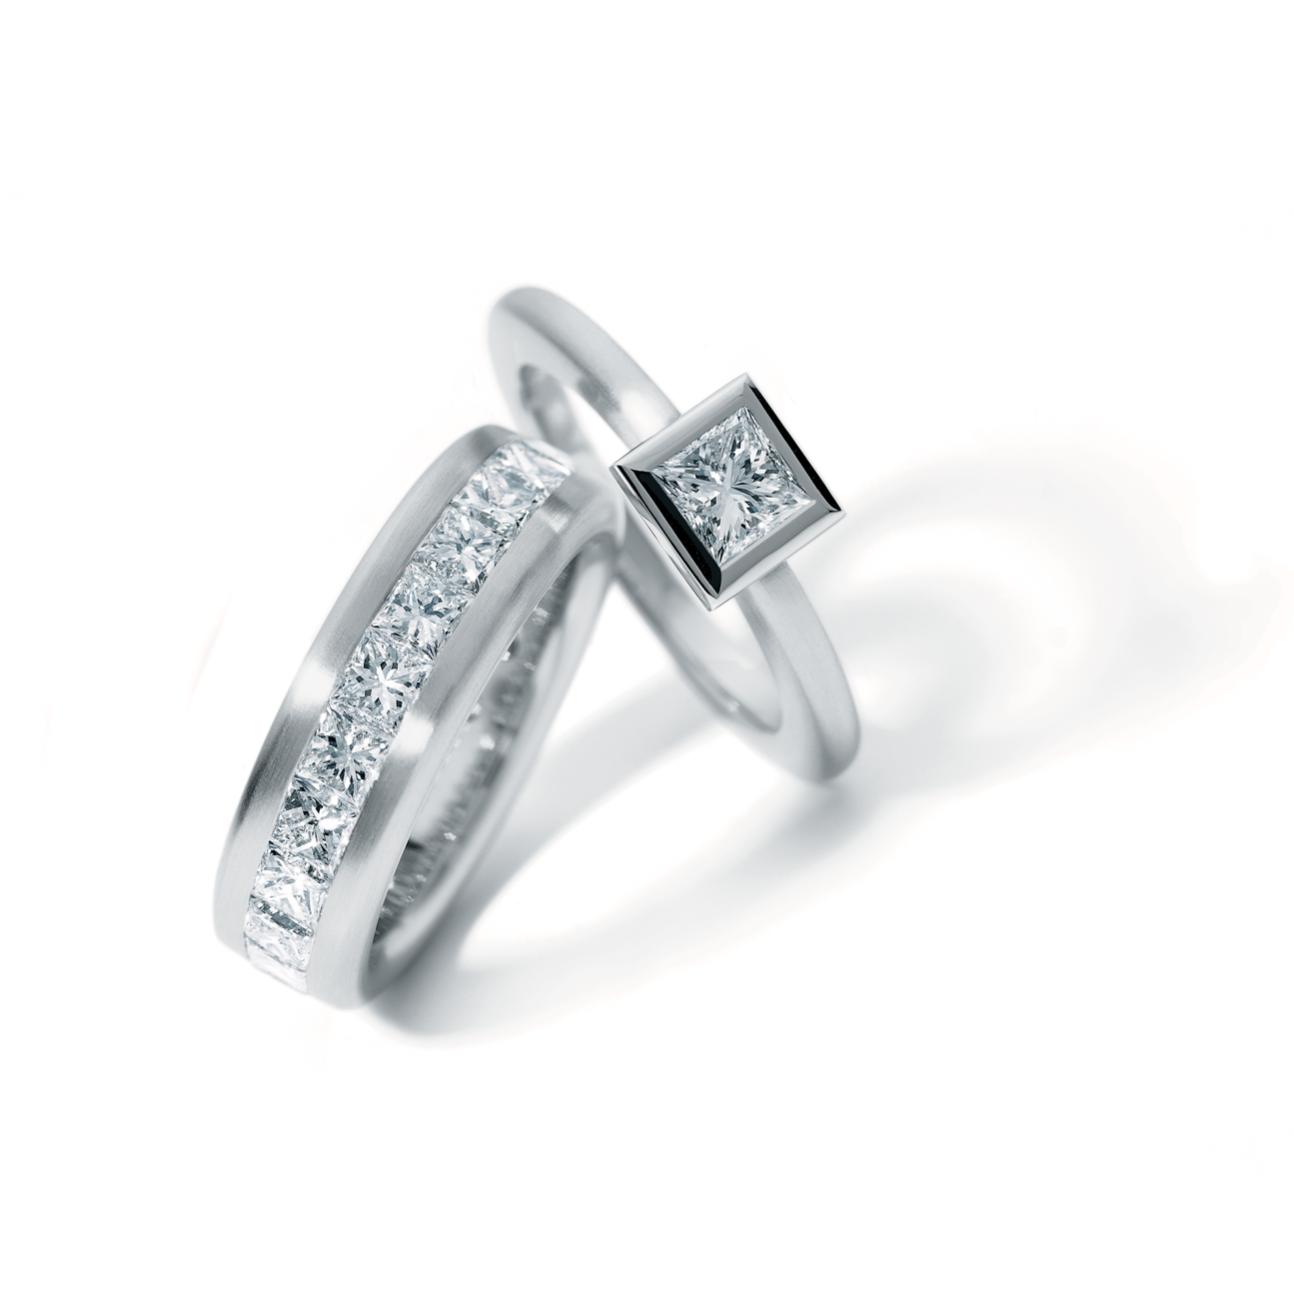 5581d1878 ORRO.co.uk - Henrich & Denzel - Platinum Diamond Engagement Ring - ORRO  Contemporary Jewellery Glasgow